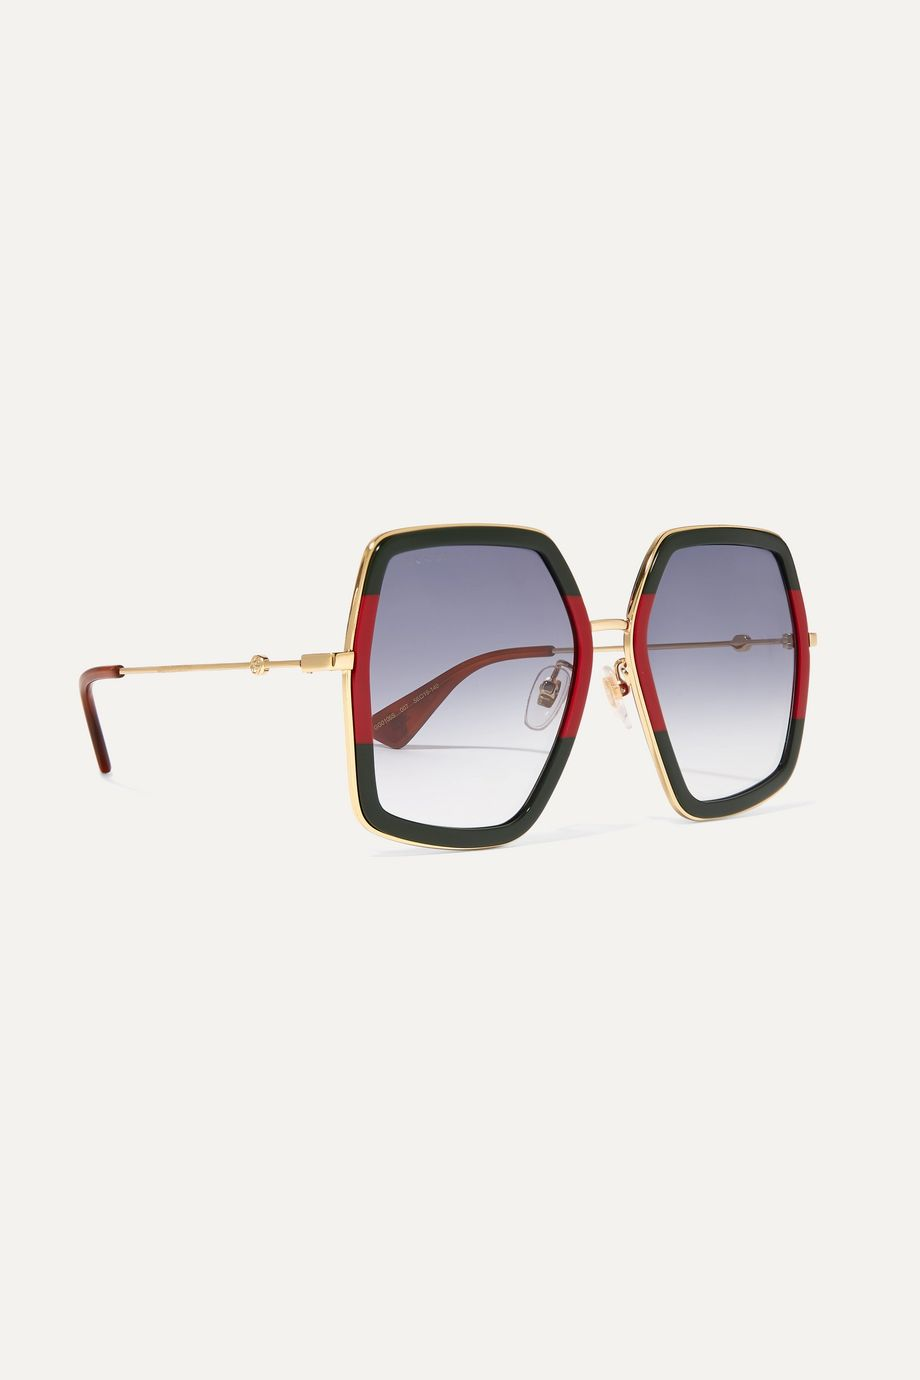 Gucci Square-frame striped acetate and gold-tone sunglasses